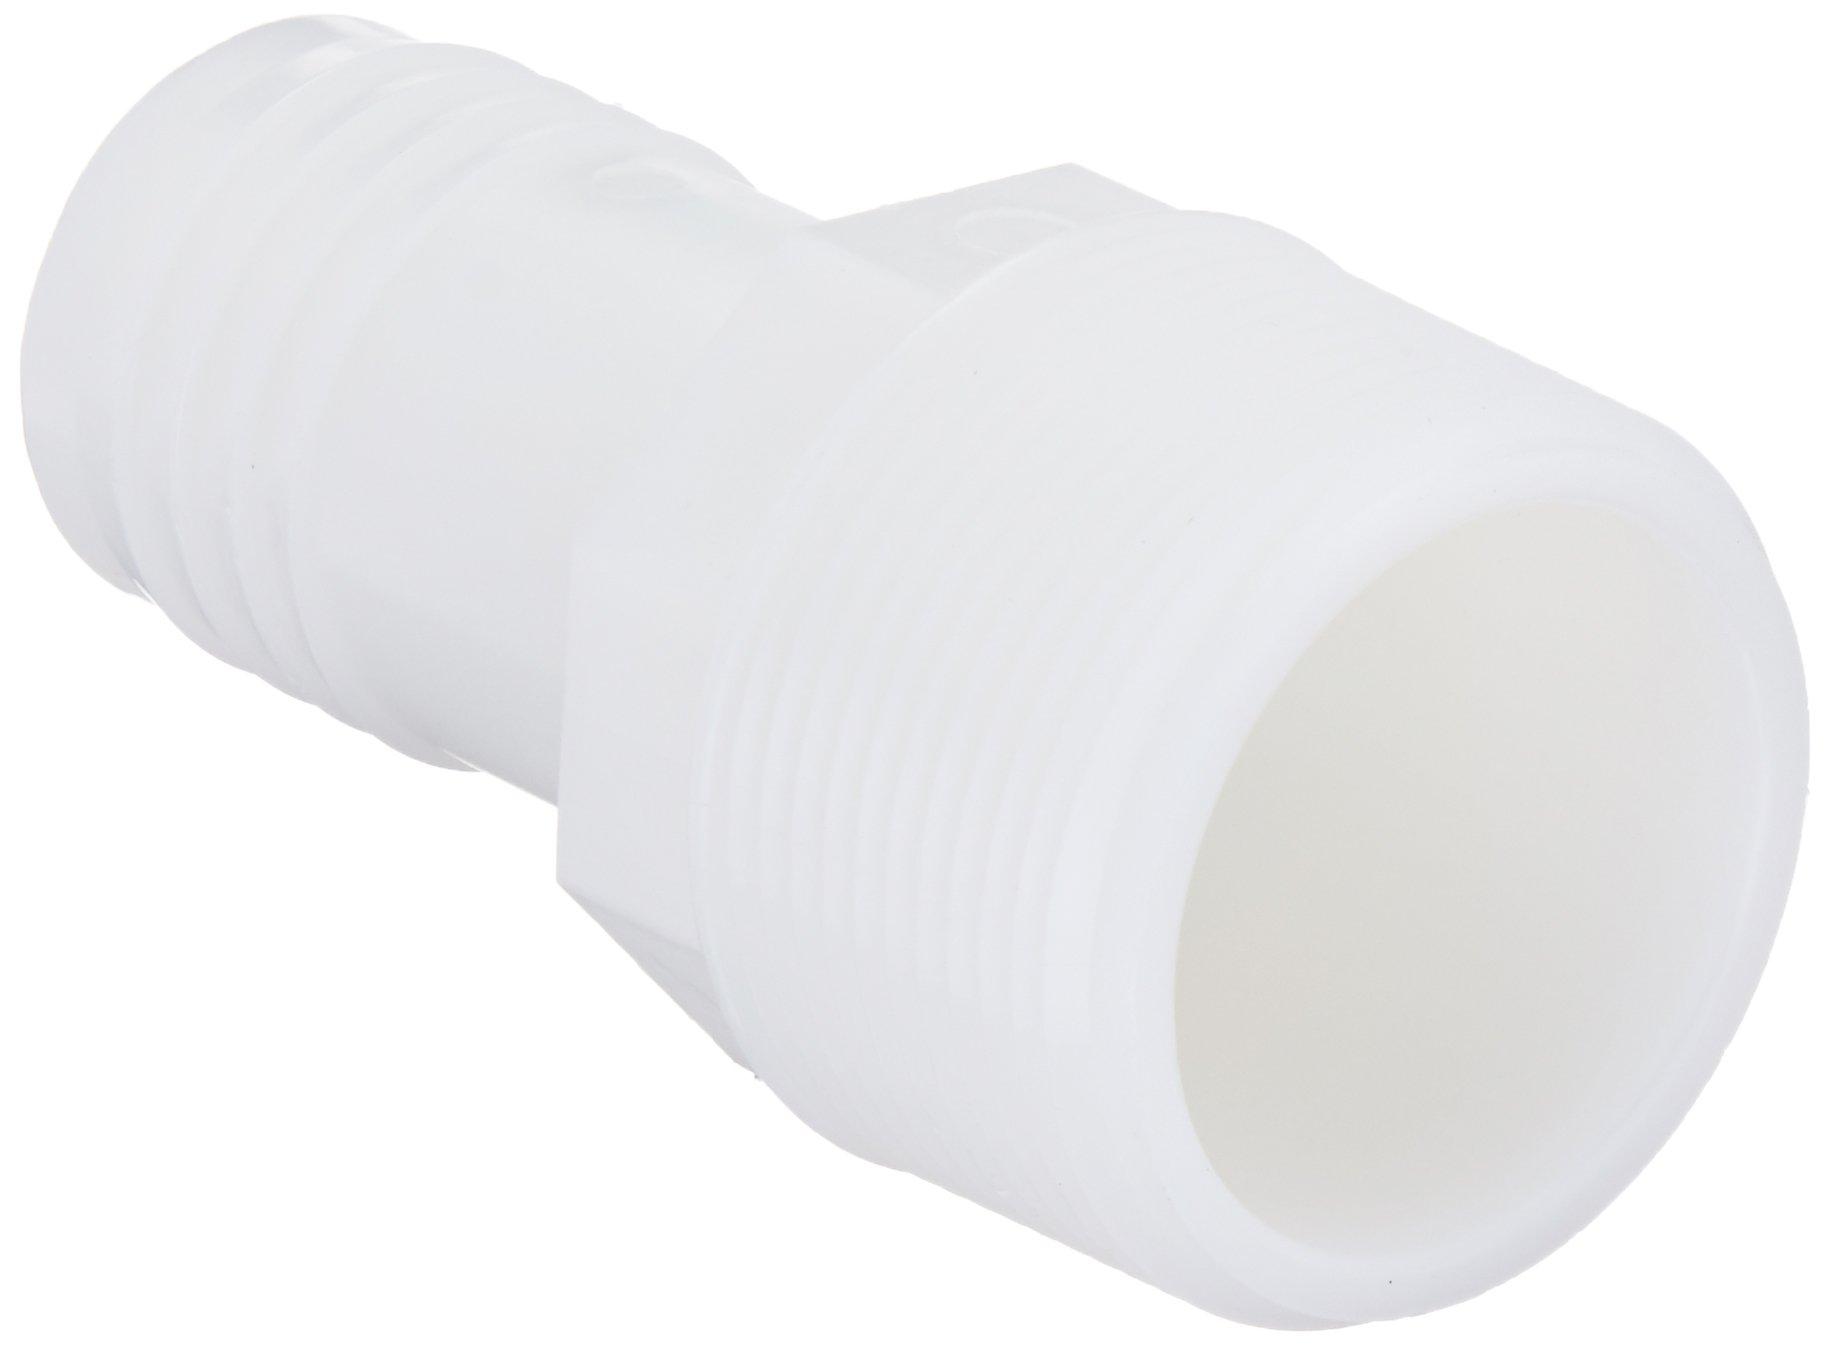 Parker Hannifin 325HB-20-24N-pk5 Par-Barb Male Connector Fitting, Nylon, 1– 1/4'' Hose Barb x 1– 1/2'' Male NPT, White (Pack of 5)